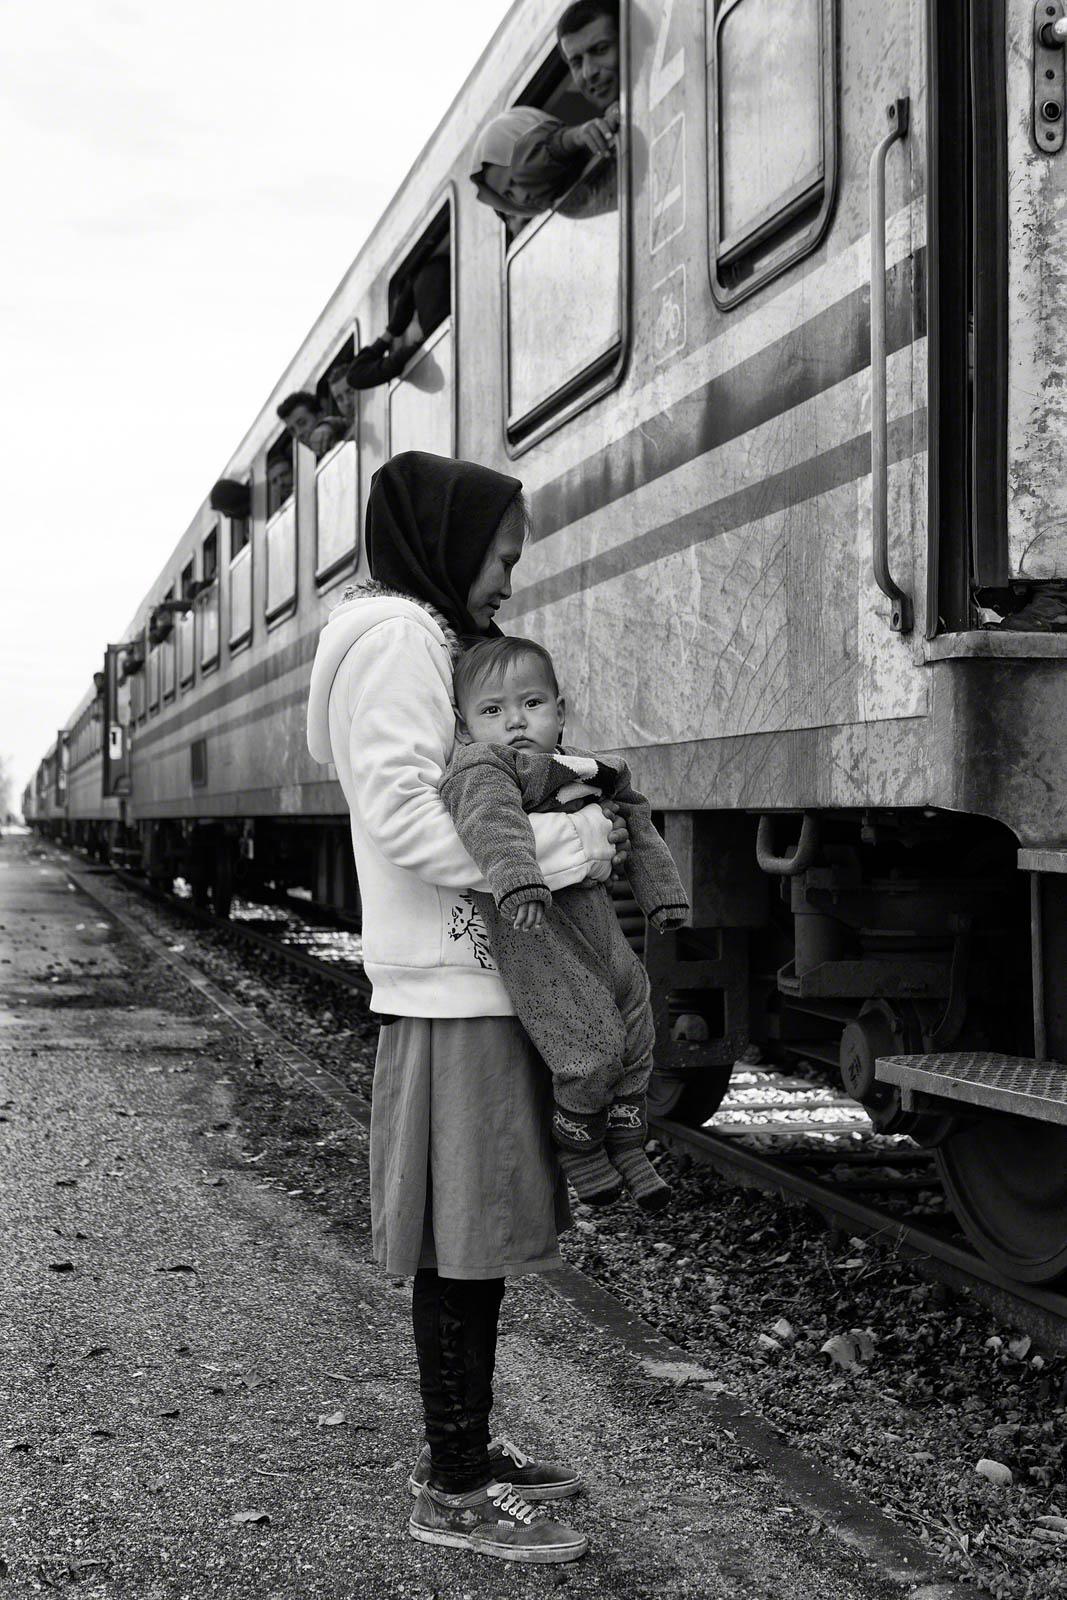 امرأة تحمل طفل وتقف بجانب القطار (© Tom Stoddart/Getty Images/Courtesy of Annenberg Space for Photography)